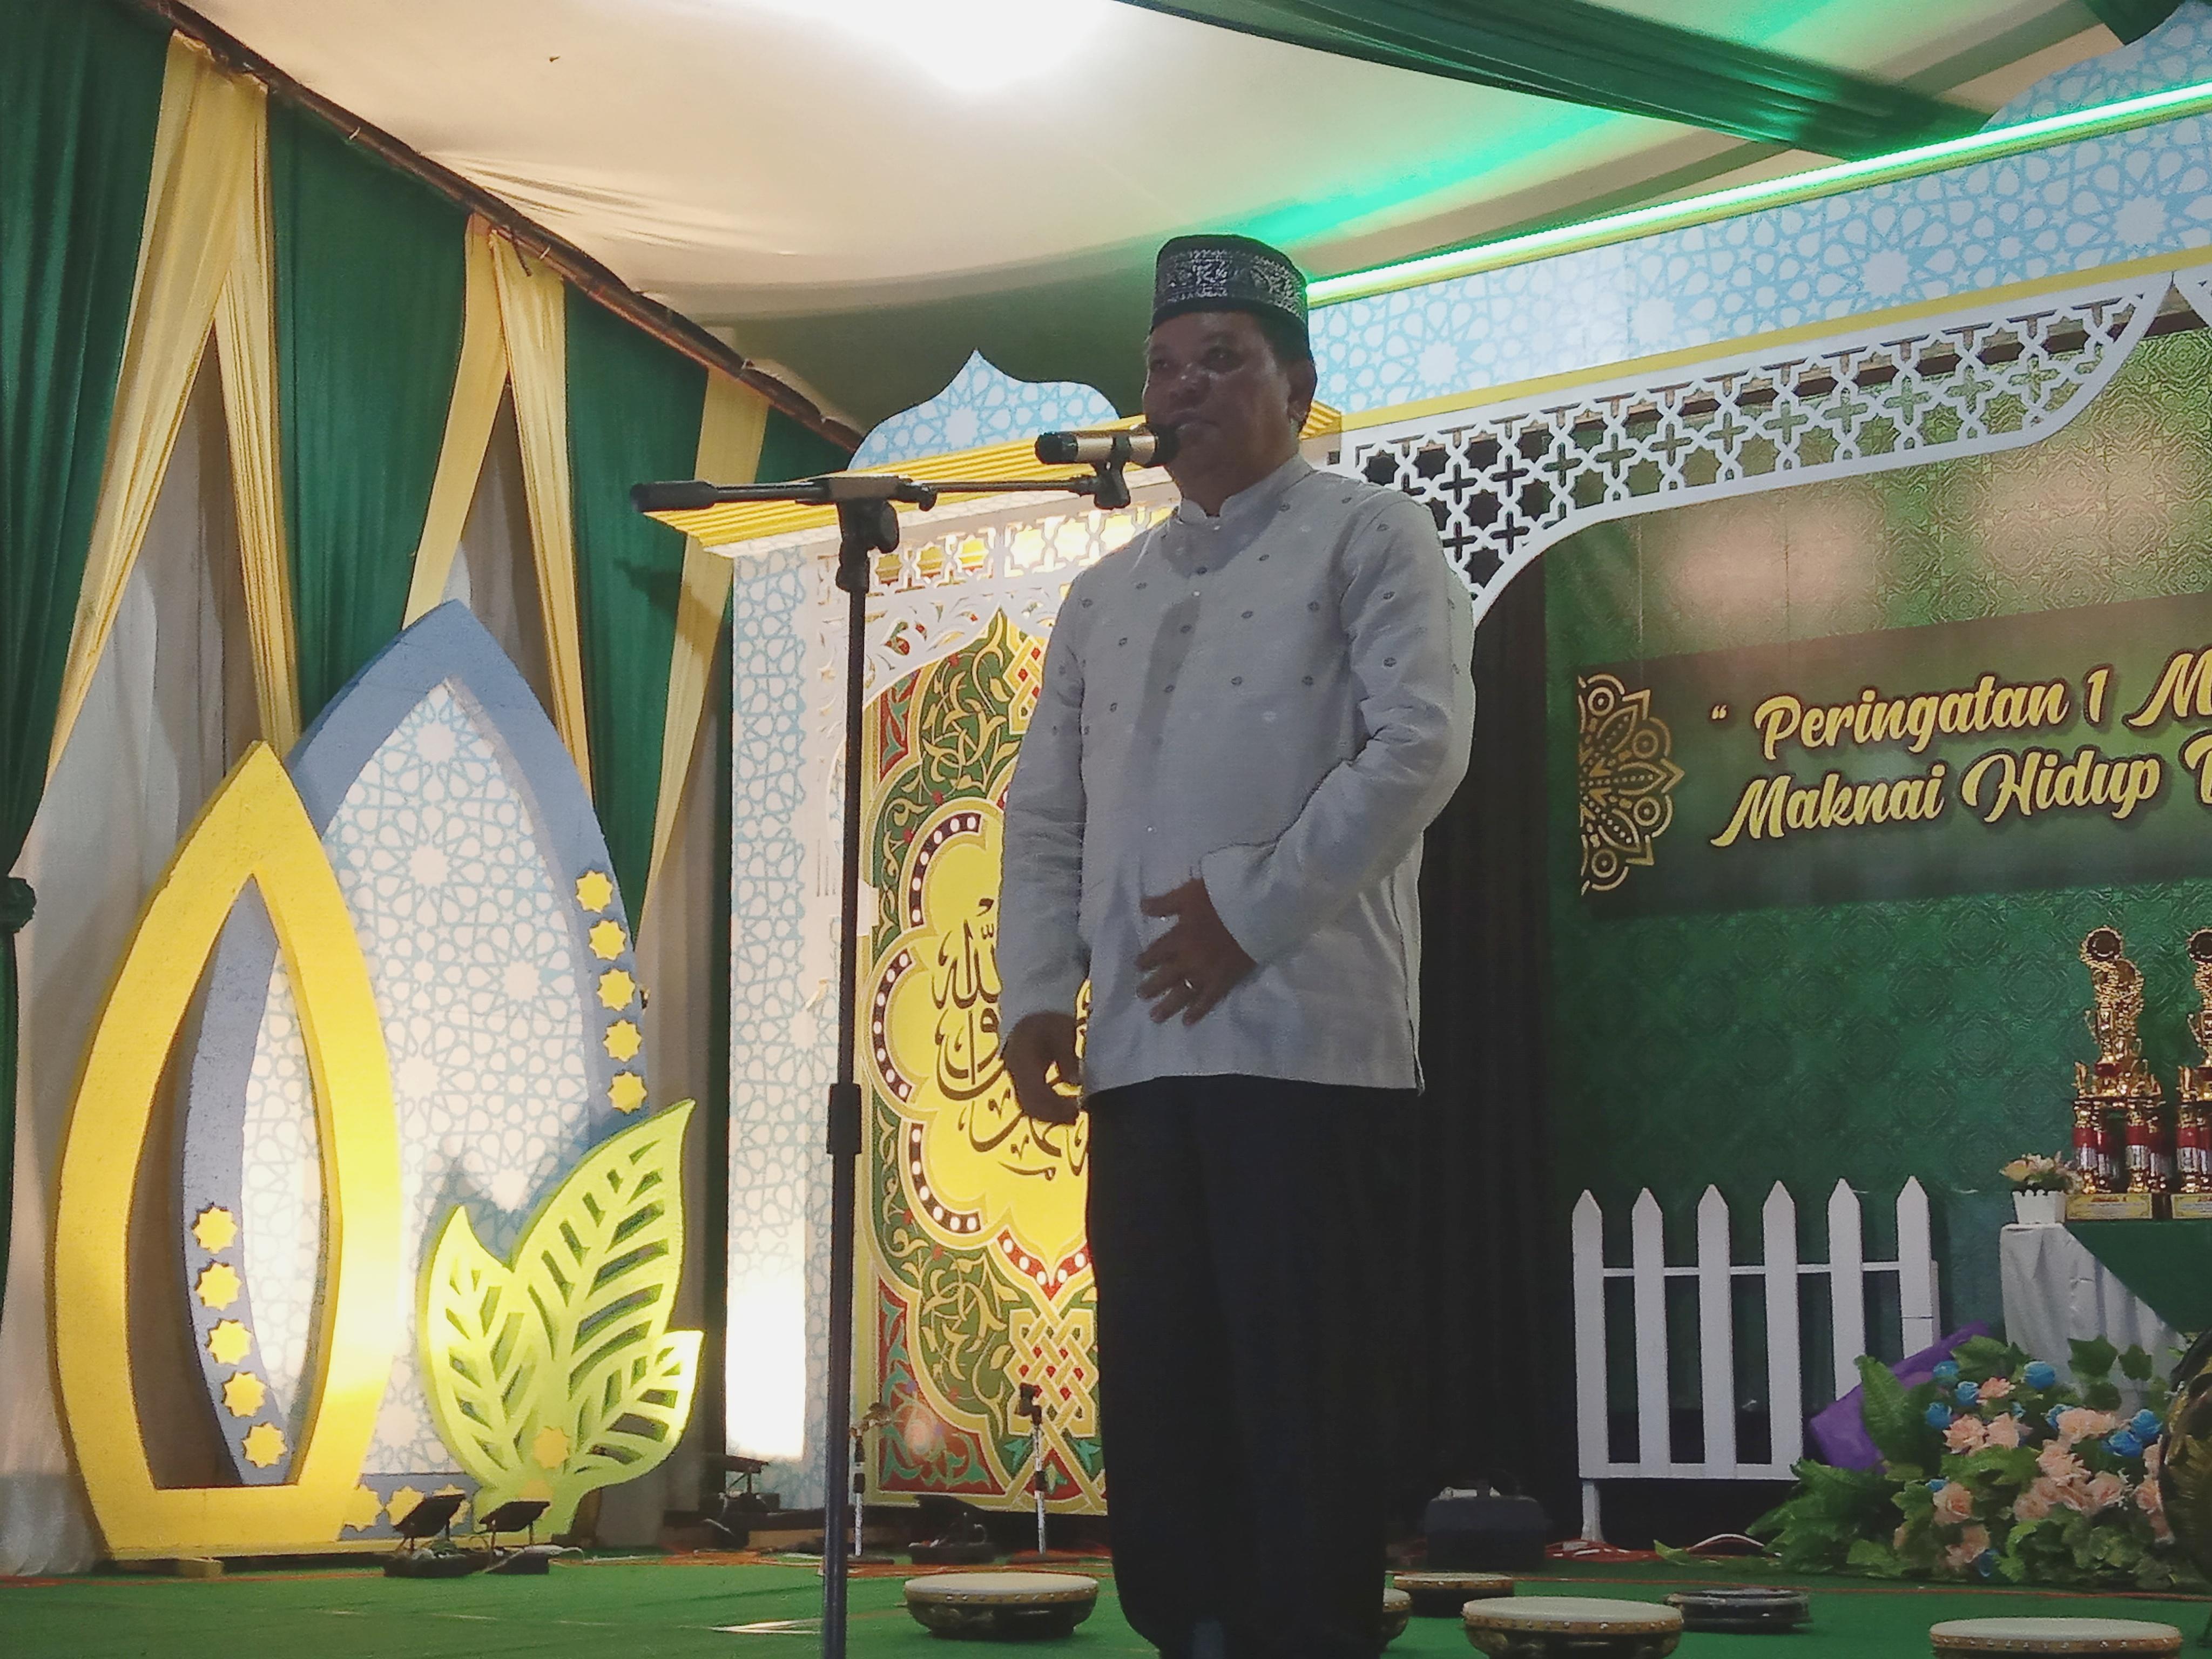 Peringatan 1 Muharram 1441 H, Bupati Sanggau: Nilai-nilai Kebudayaan dan Kehidupan Yang Islami Terus di Perkuat